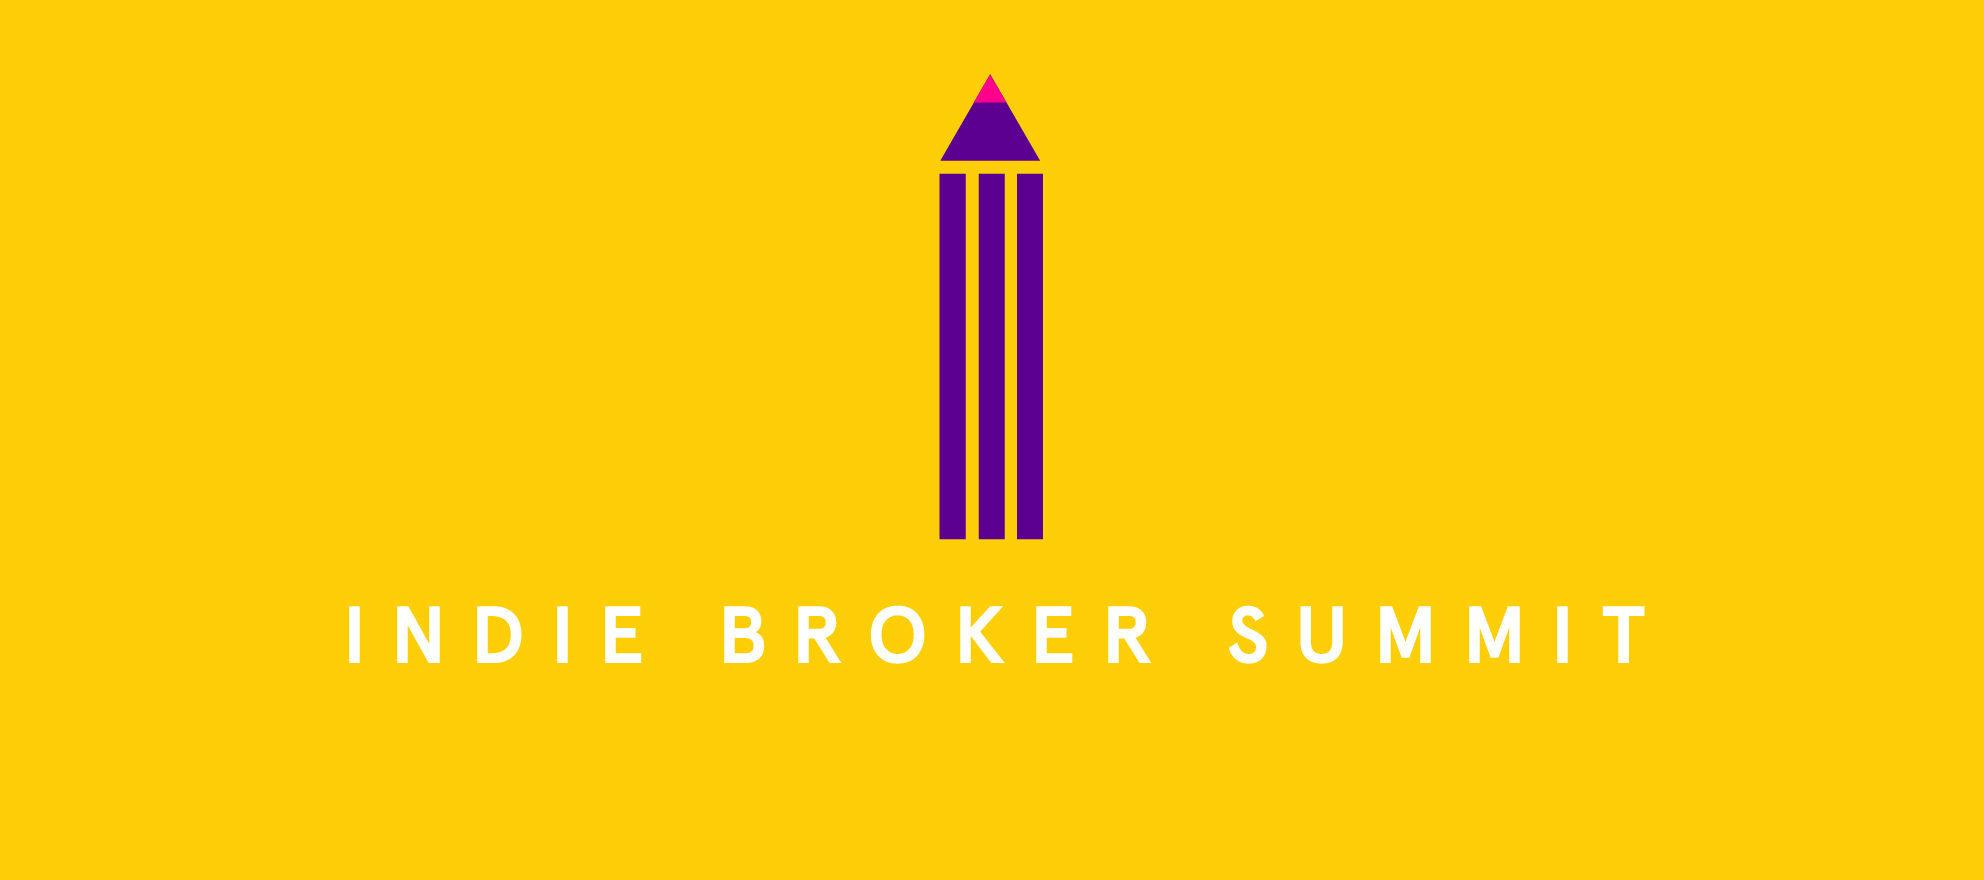 indie broker summit